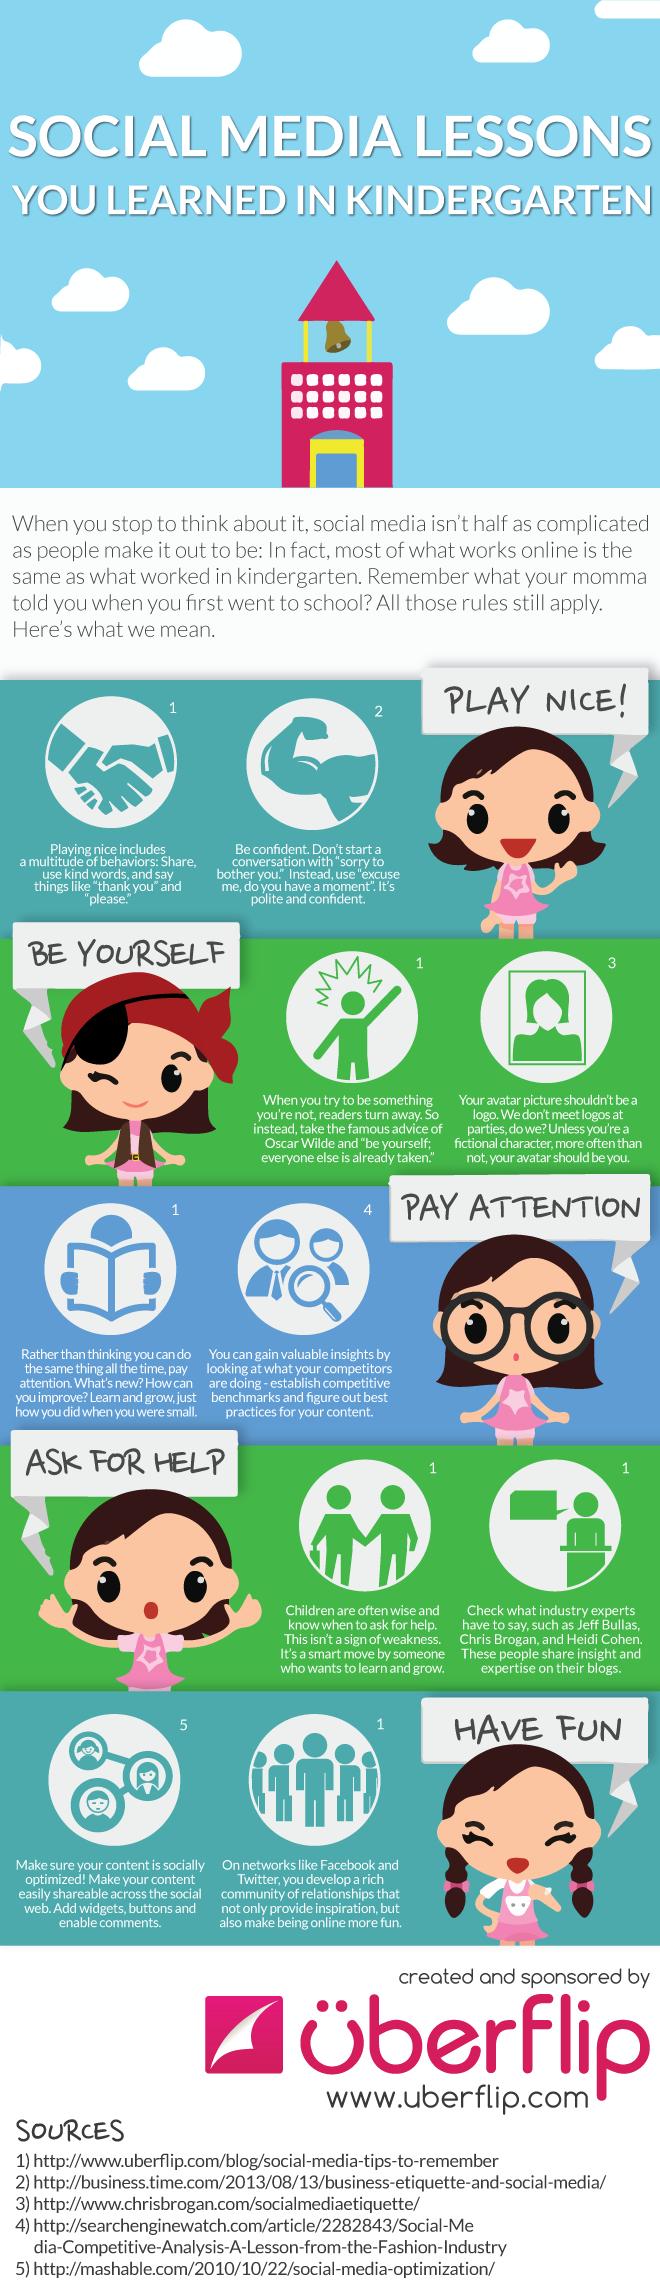 social-media-lessons-kindergarten